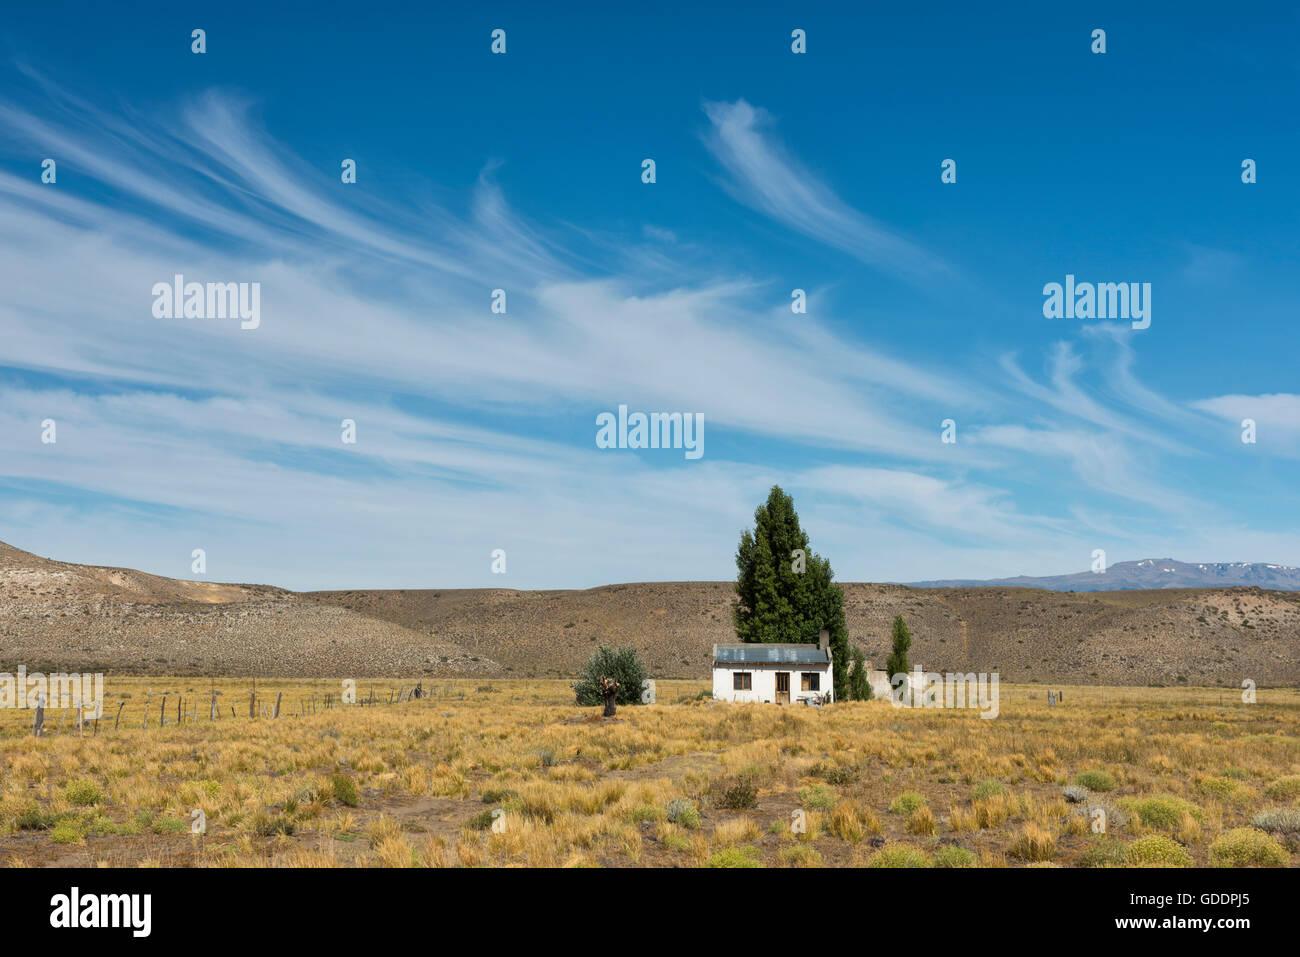 América del Sur,Argentina,Chubut, Patagonia,casa en la Pampa Imagen De Stock